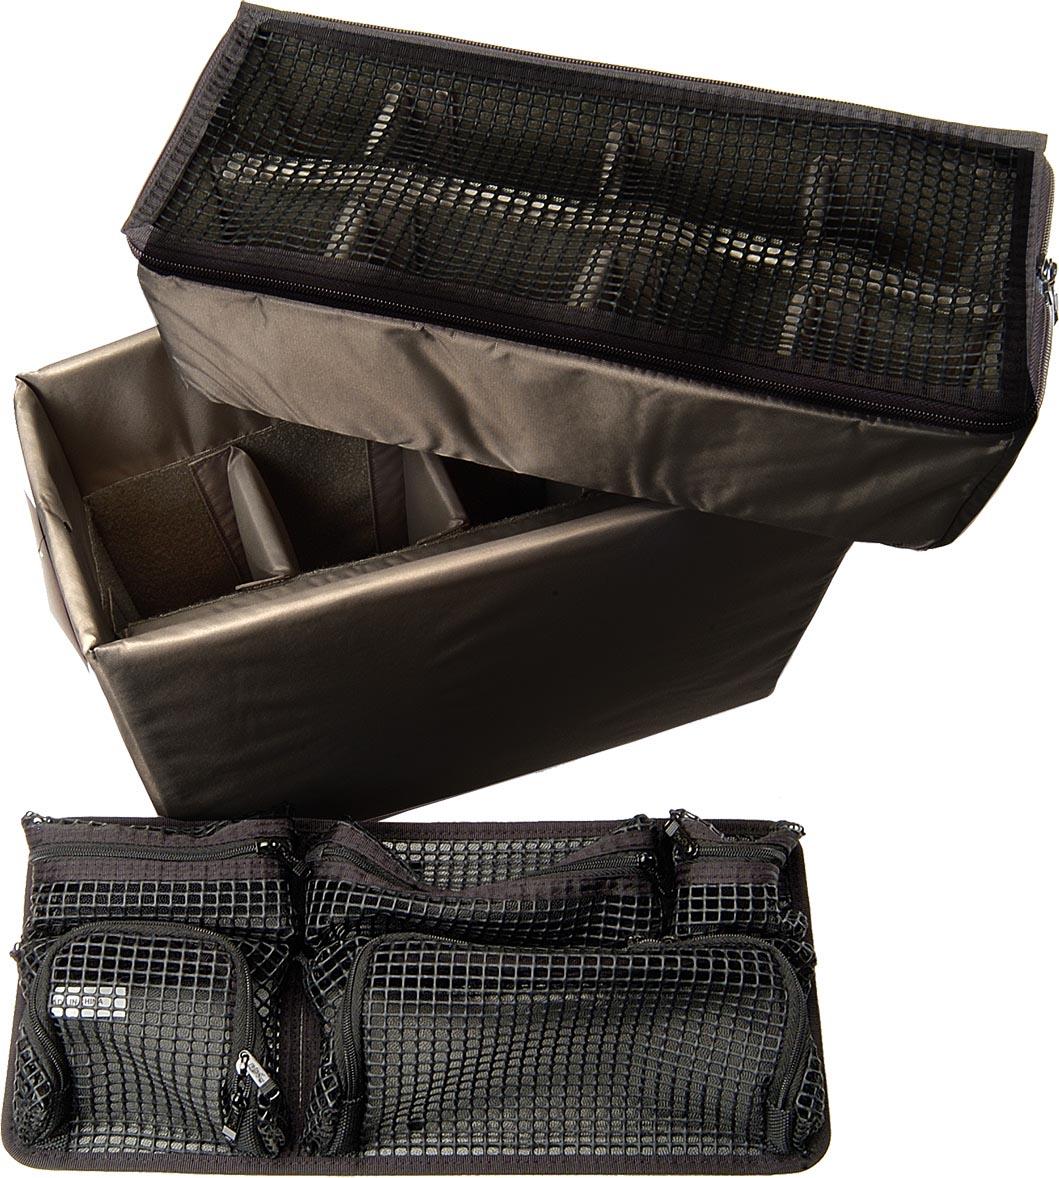 pelican 1440 case padded dividers lid